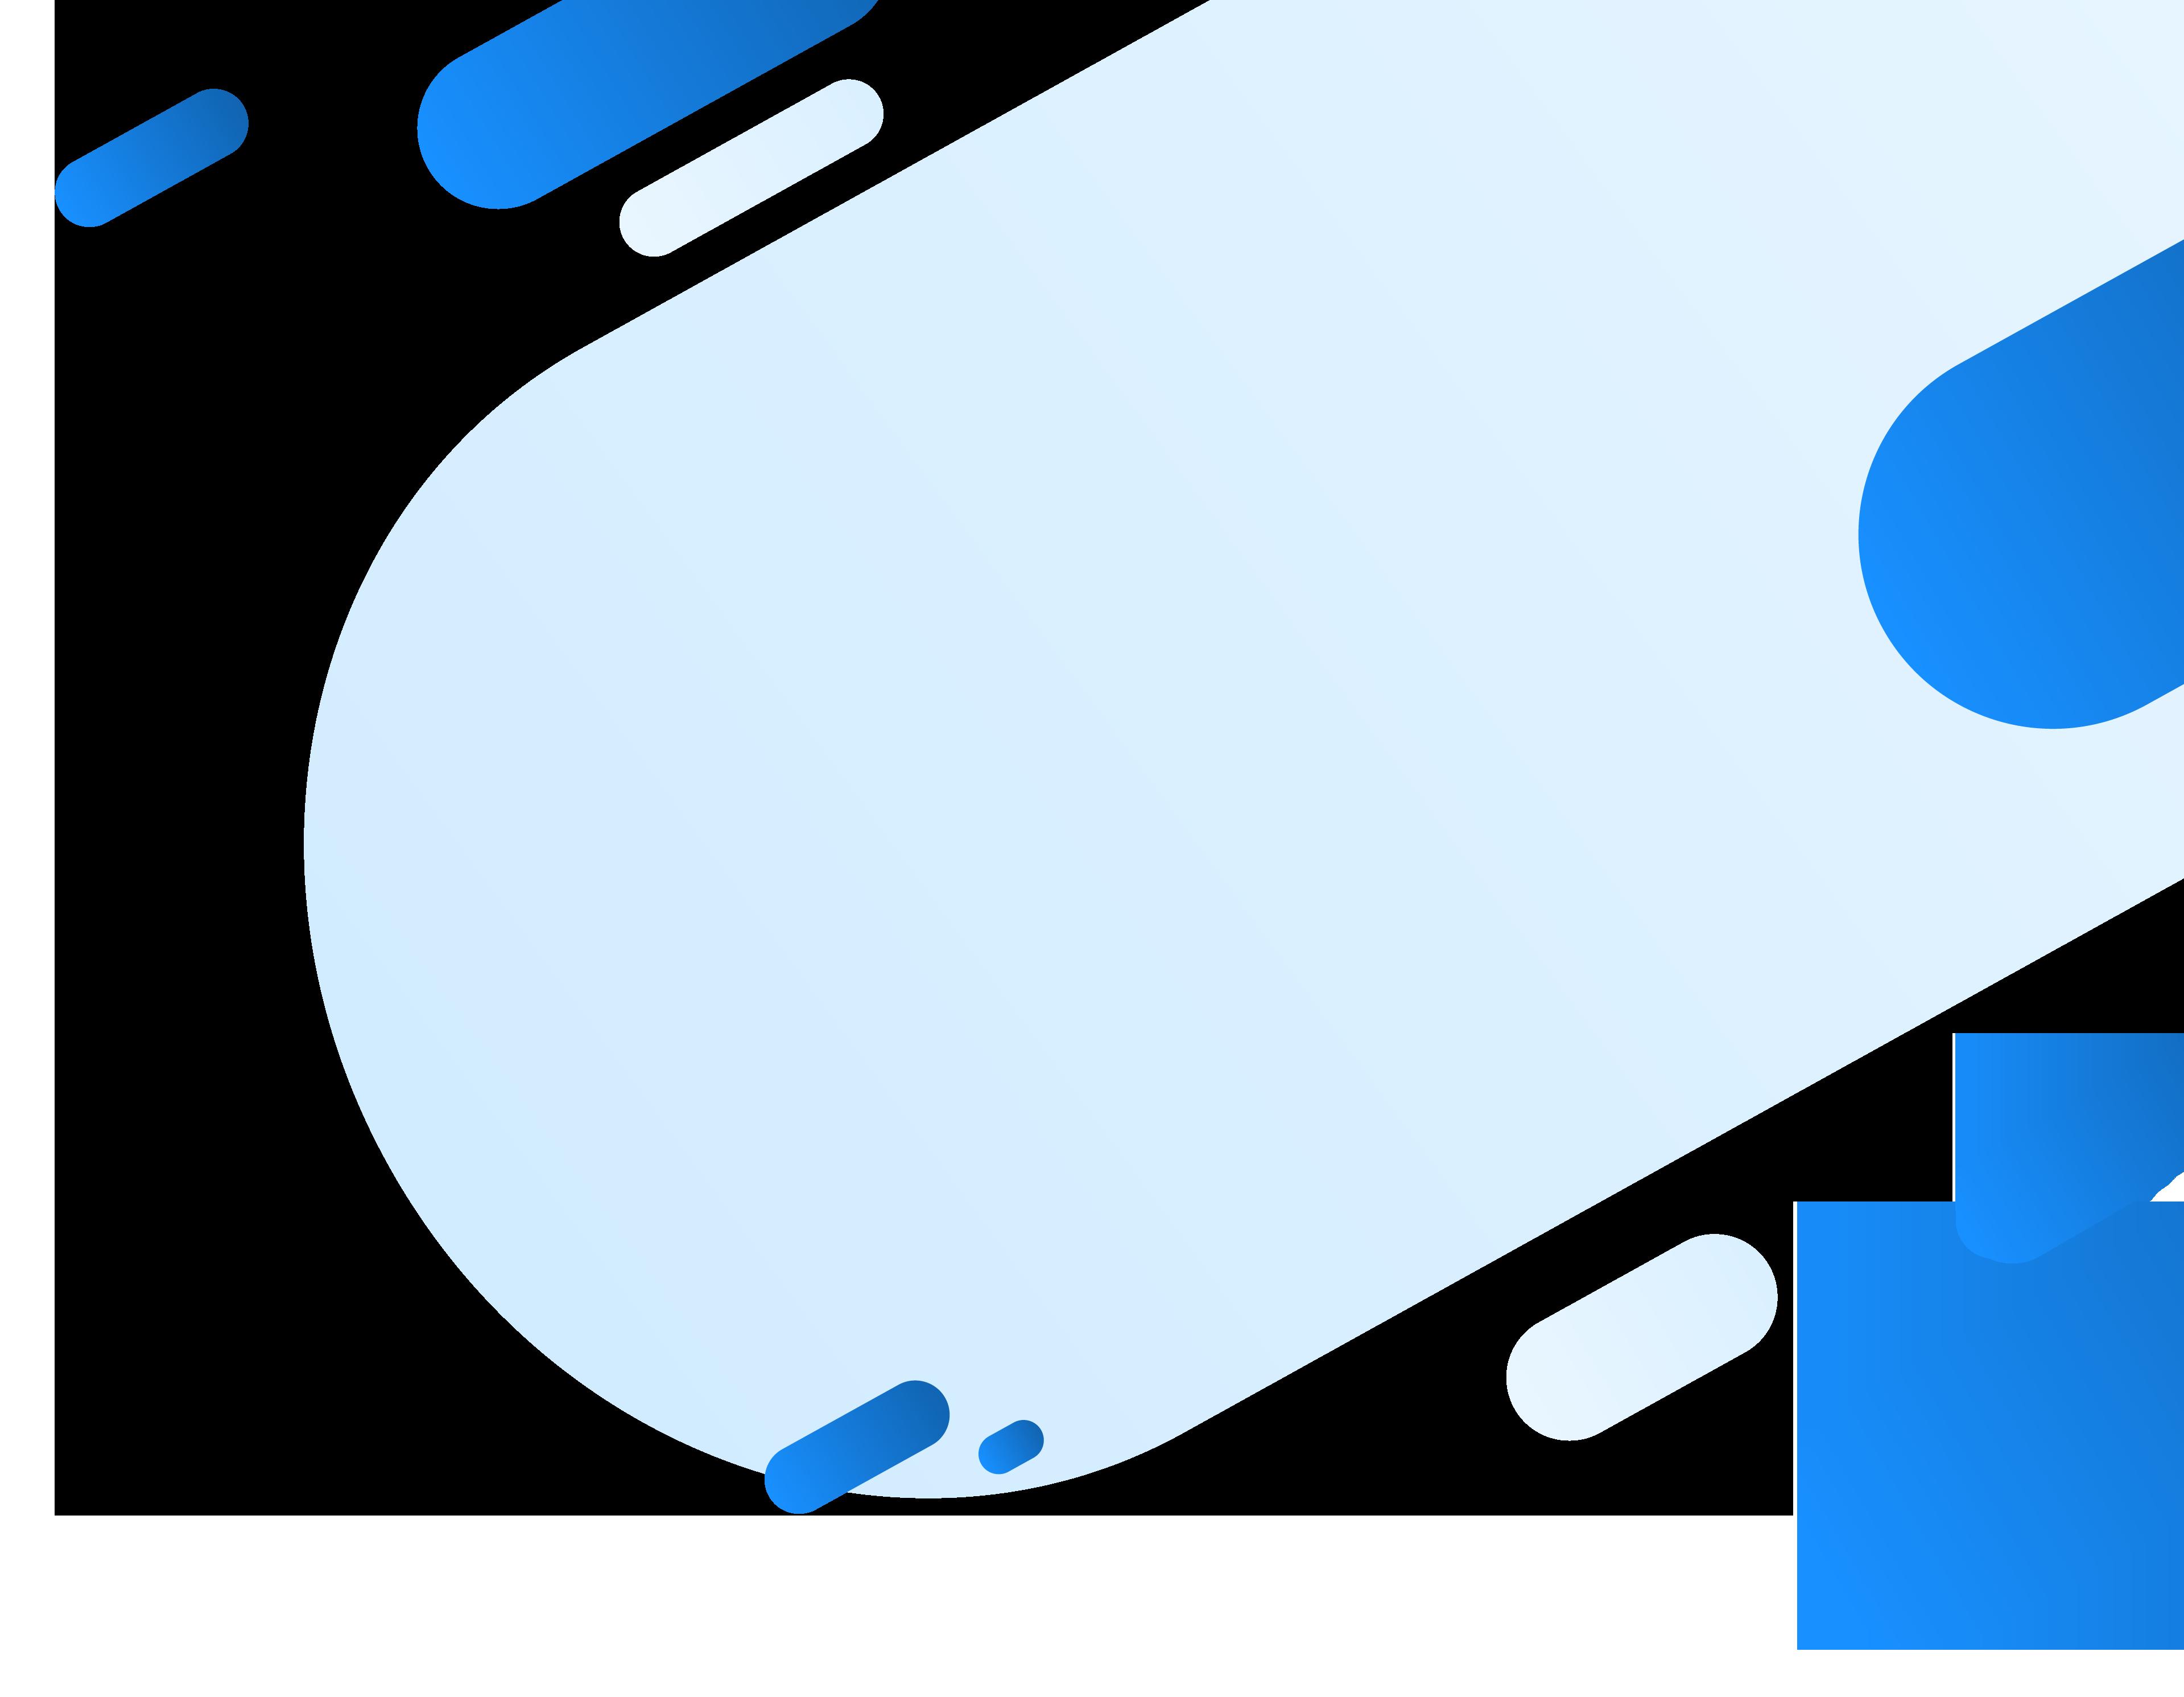 imagen flotante